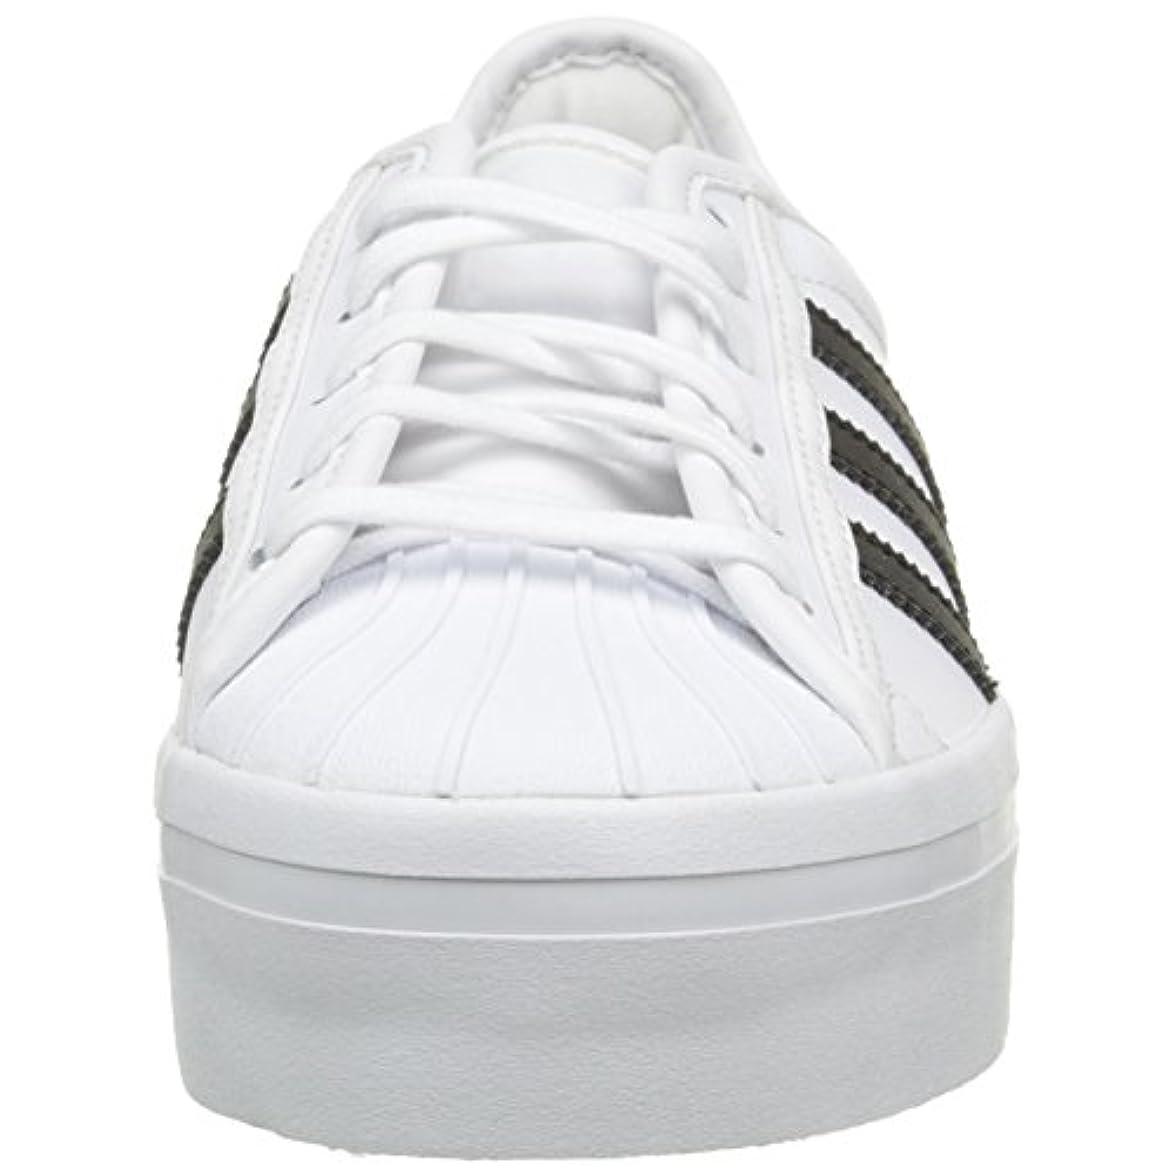 Superstar Donna Adidas - Basse Rize